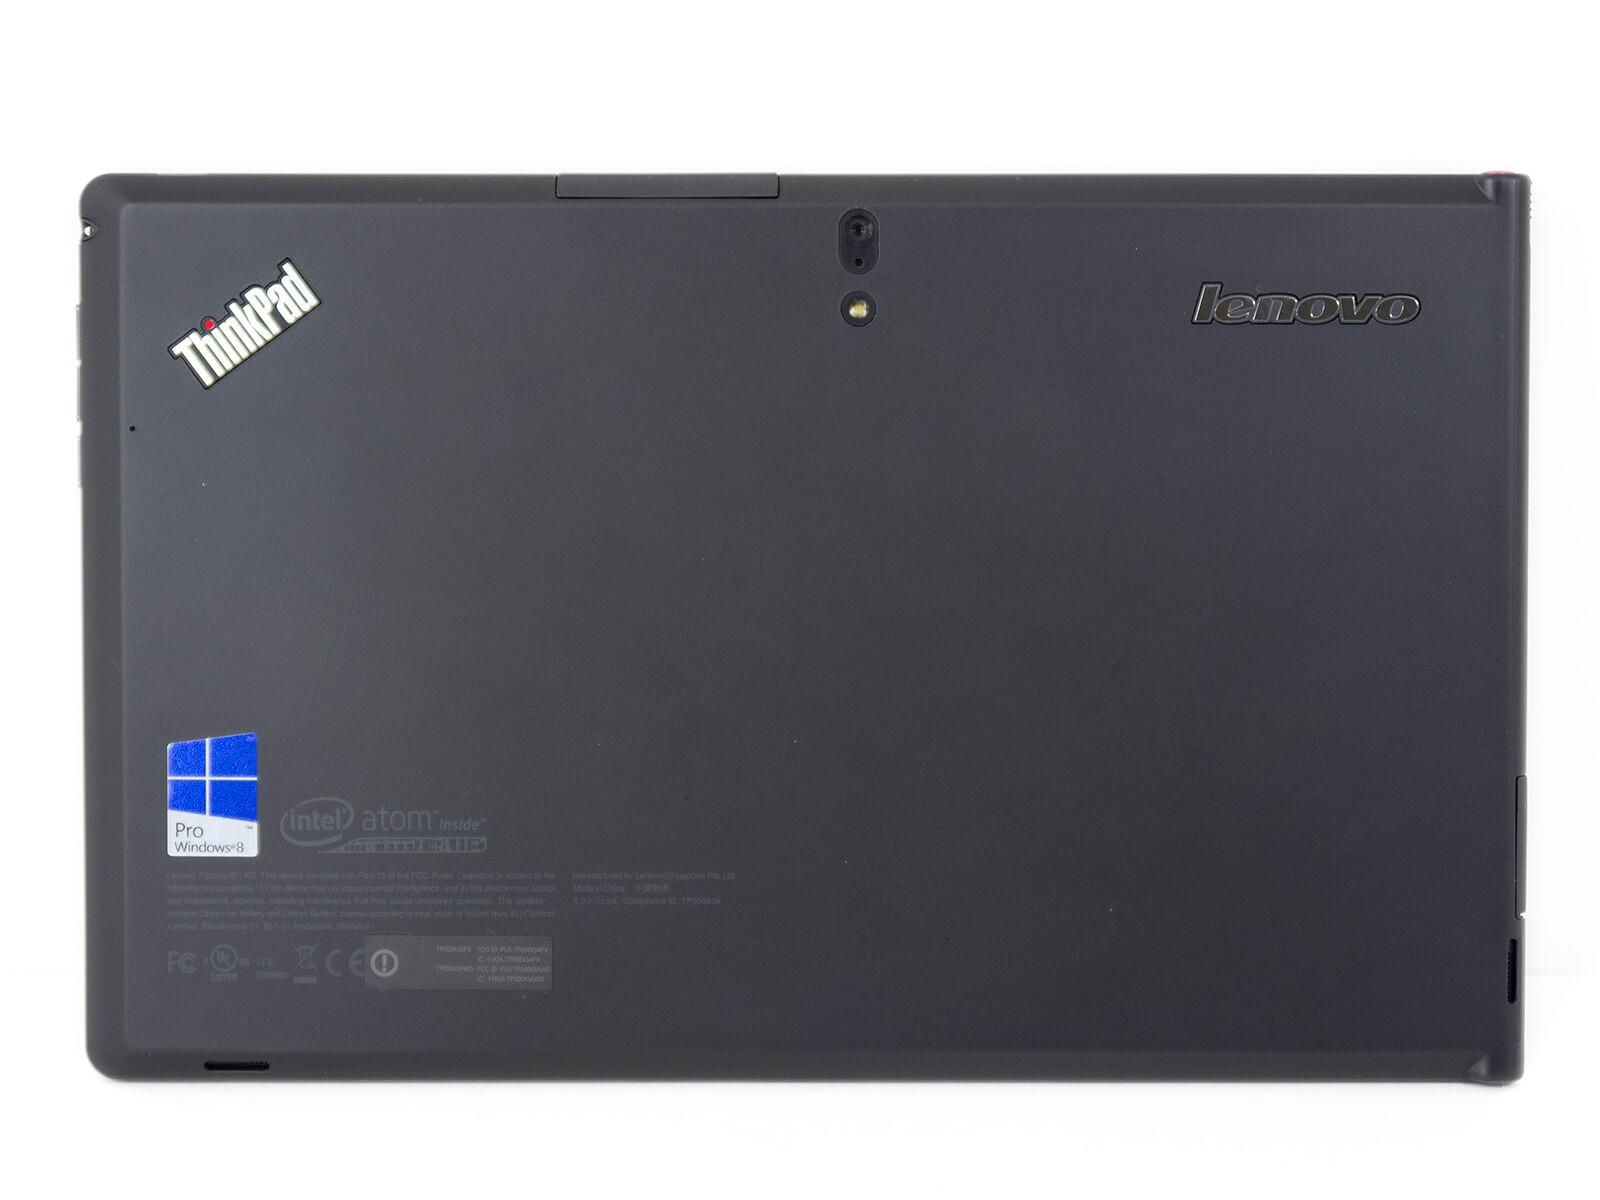 Lenovo Thinkpad Tablet 2 Specs